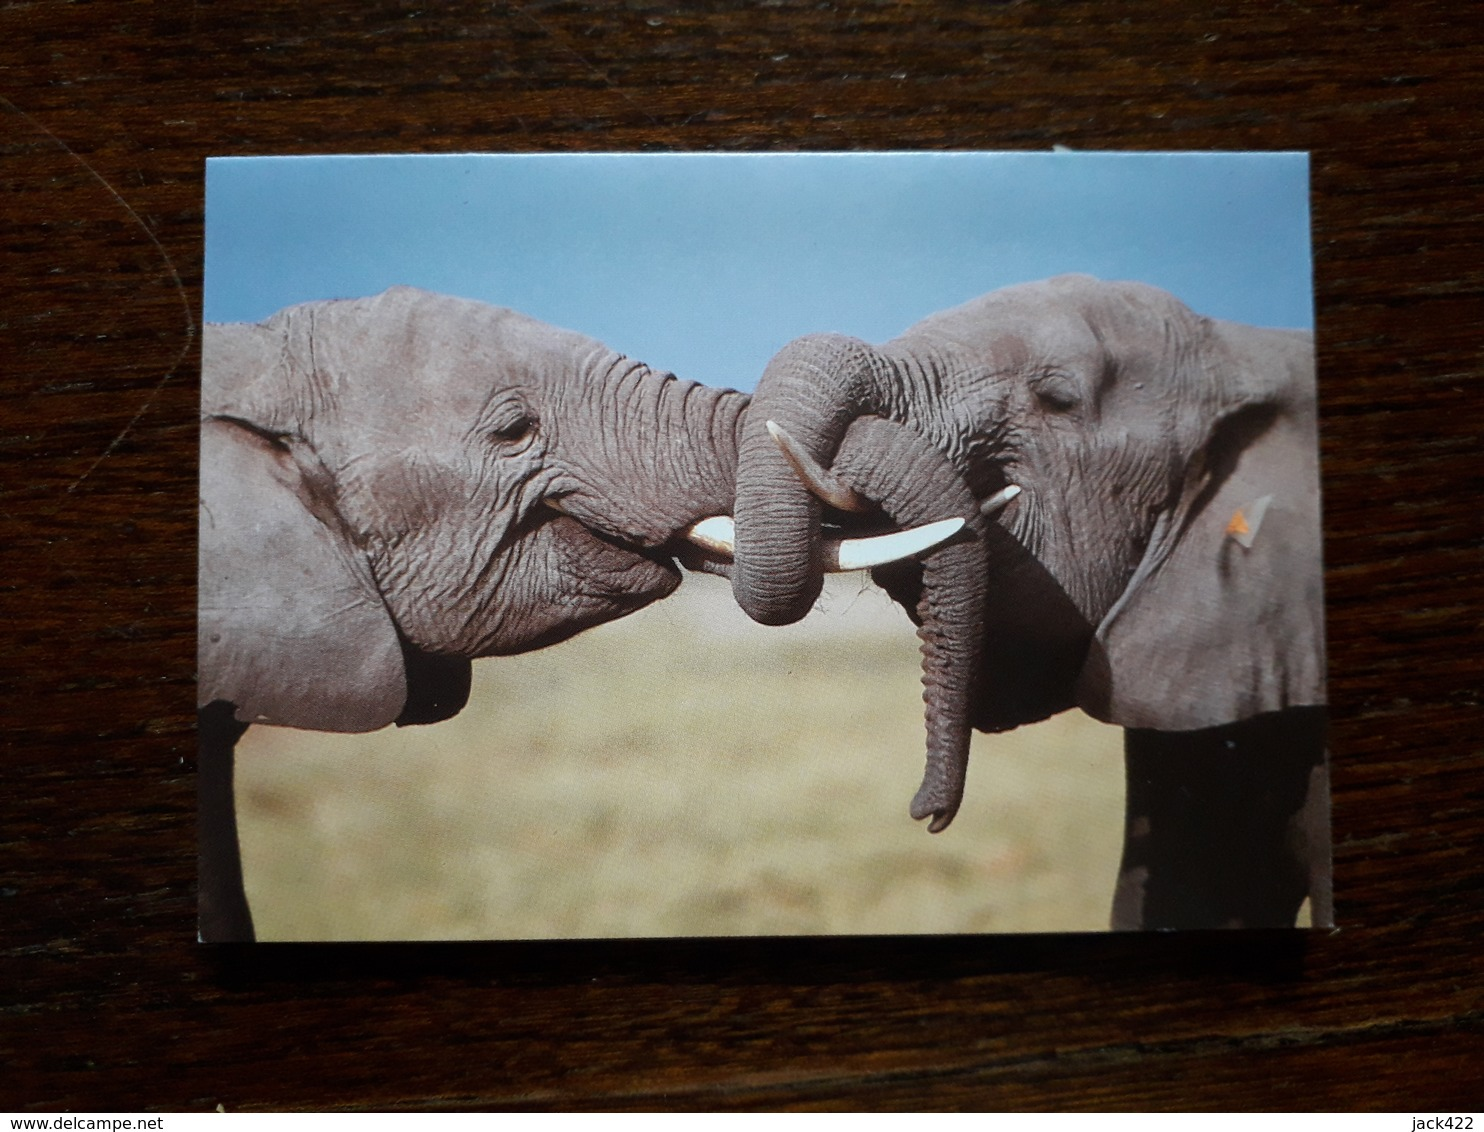 L20/18 Mini Calendrier Publicitaire. 2001. Elephants.Chateaubriant. Tabac Presse - Calendars